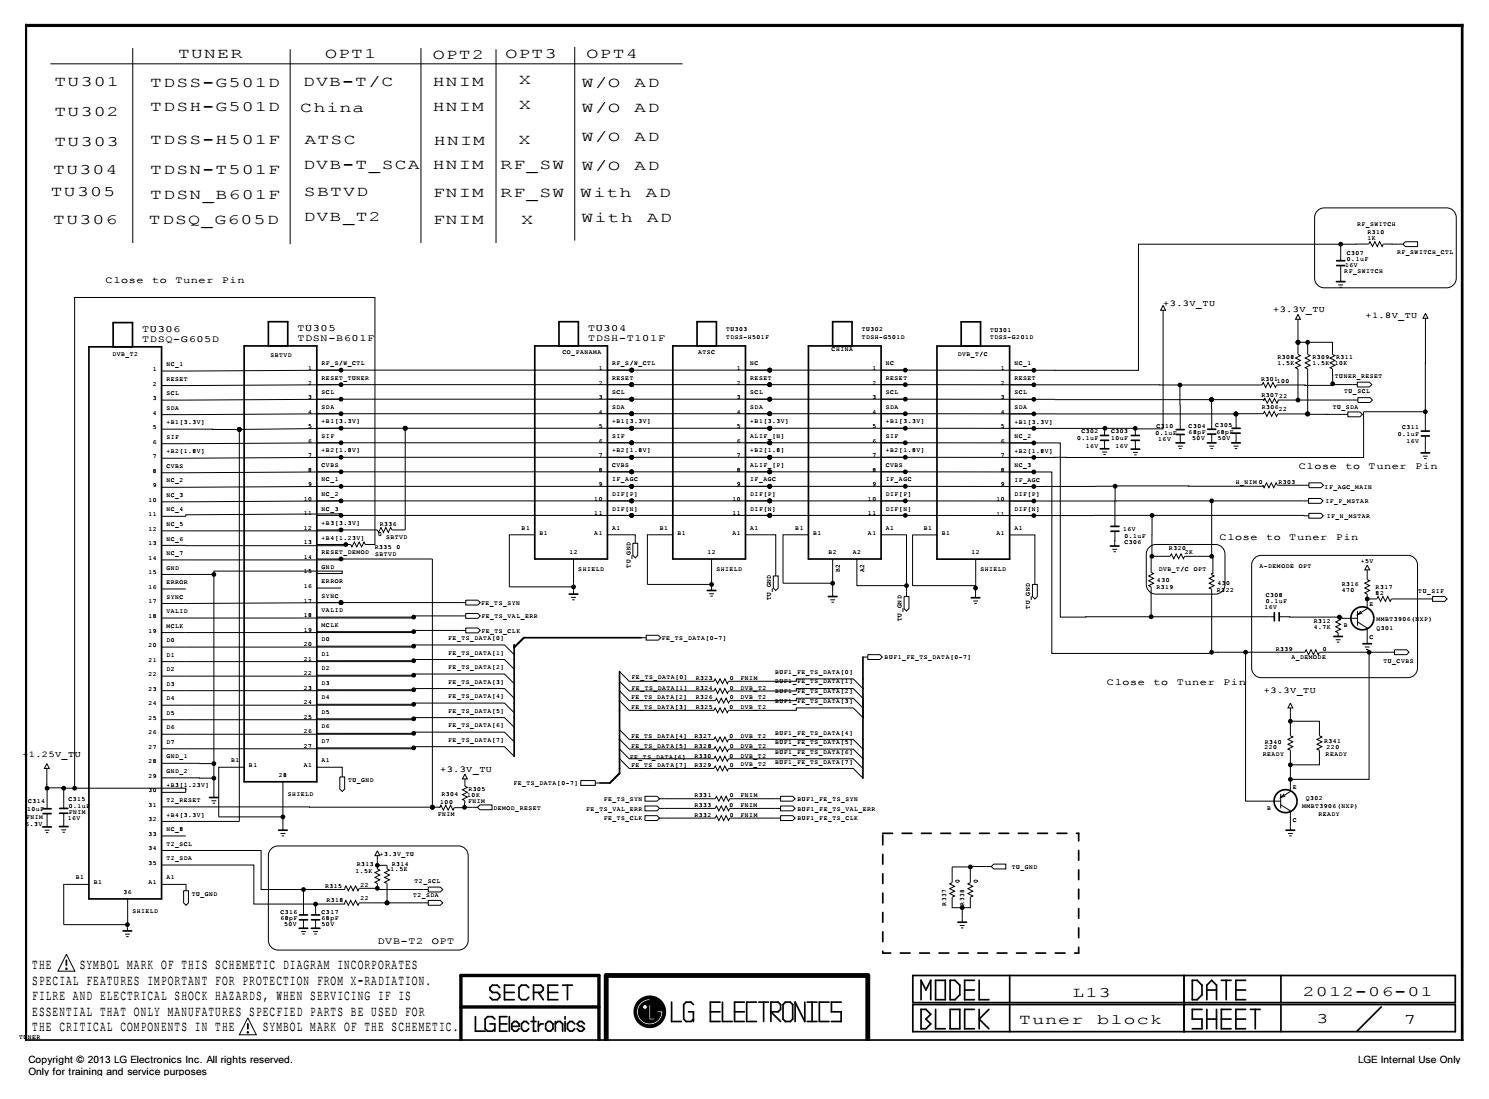 Manual de serviço tv lg 42pn4500 sa chassis pb31a by